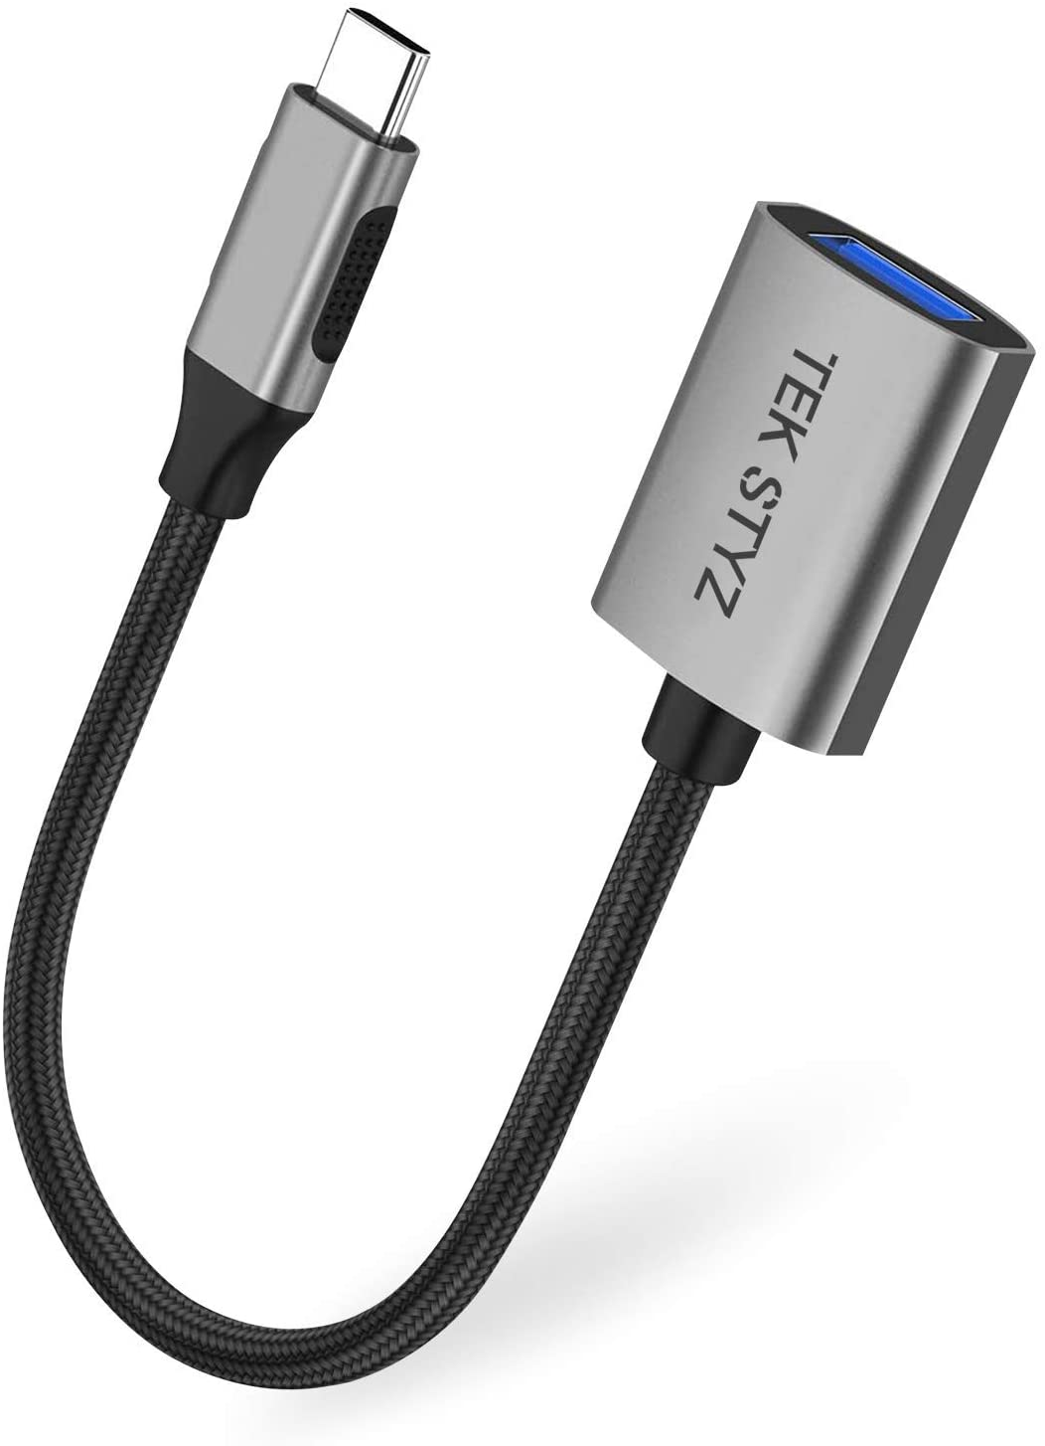 Tek Styz OTG to USB Works for Samsung Galaxy Tab 4 7.0 with Full Speed On-The-Go Power White